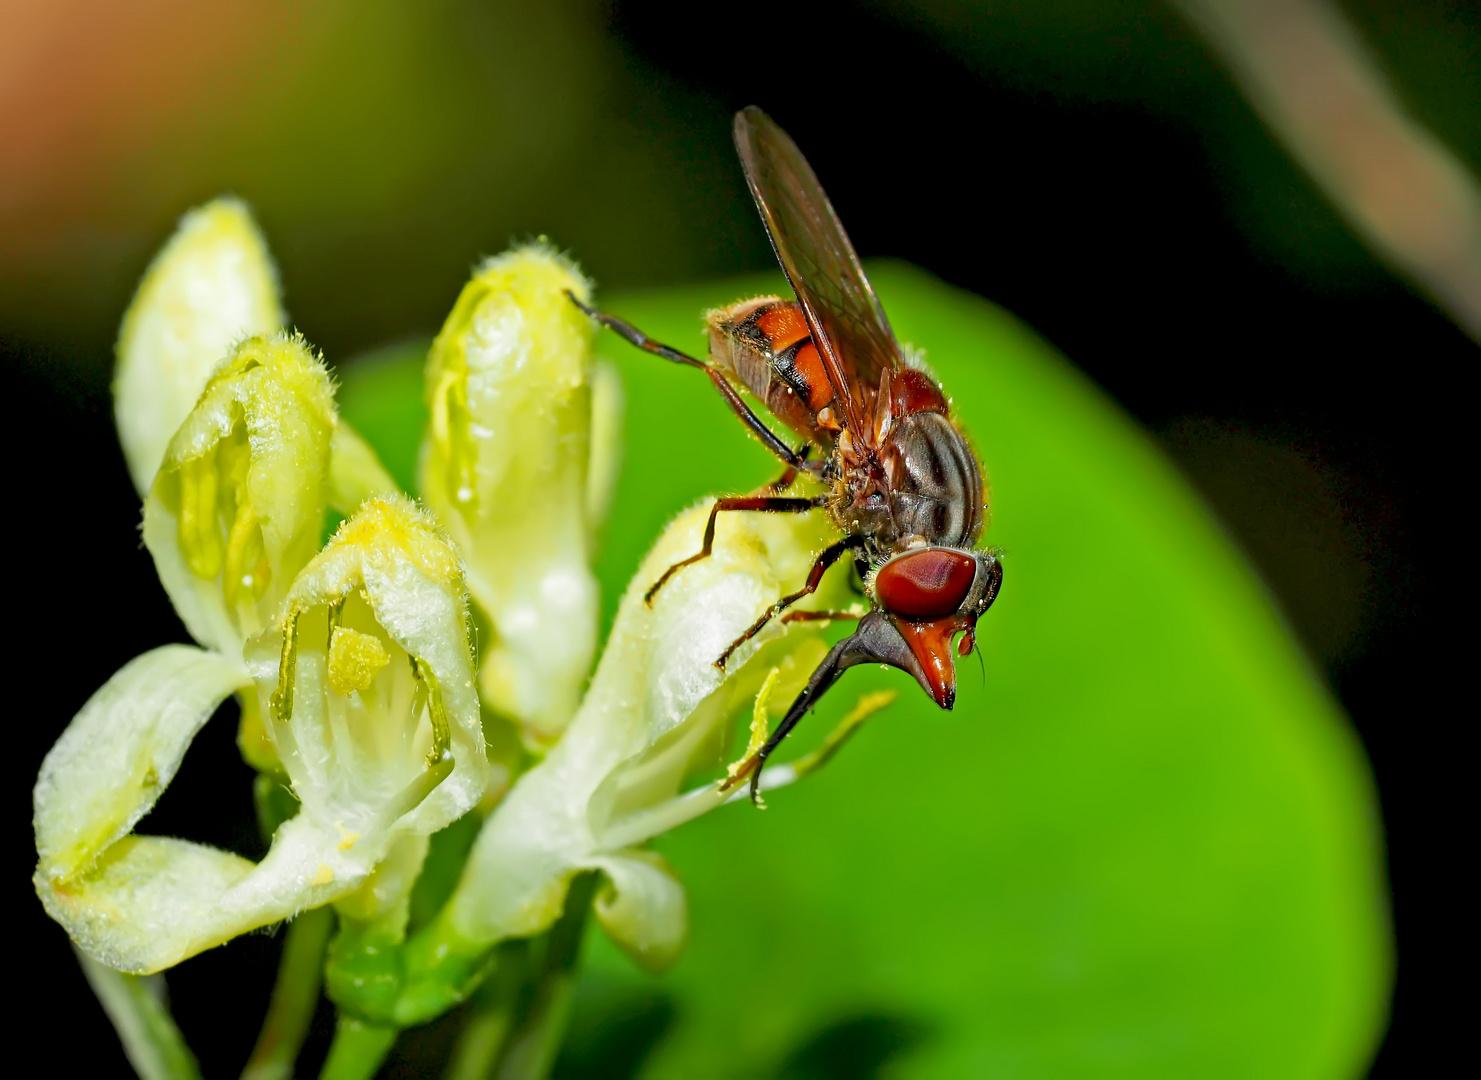 Gemeine Schnauzenschwebfliege (Rhingia campestris) - Rhyngie champêtre.